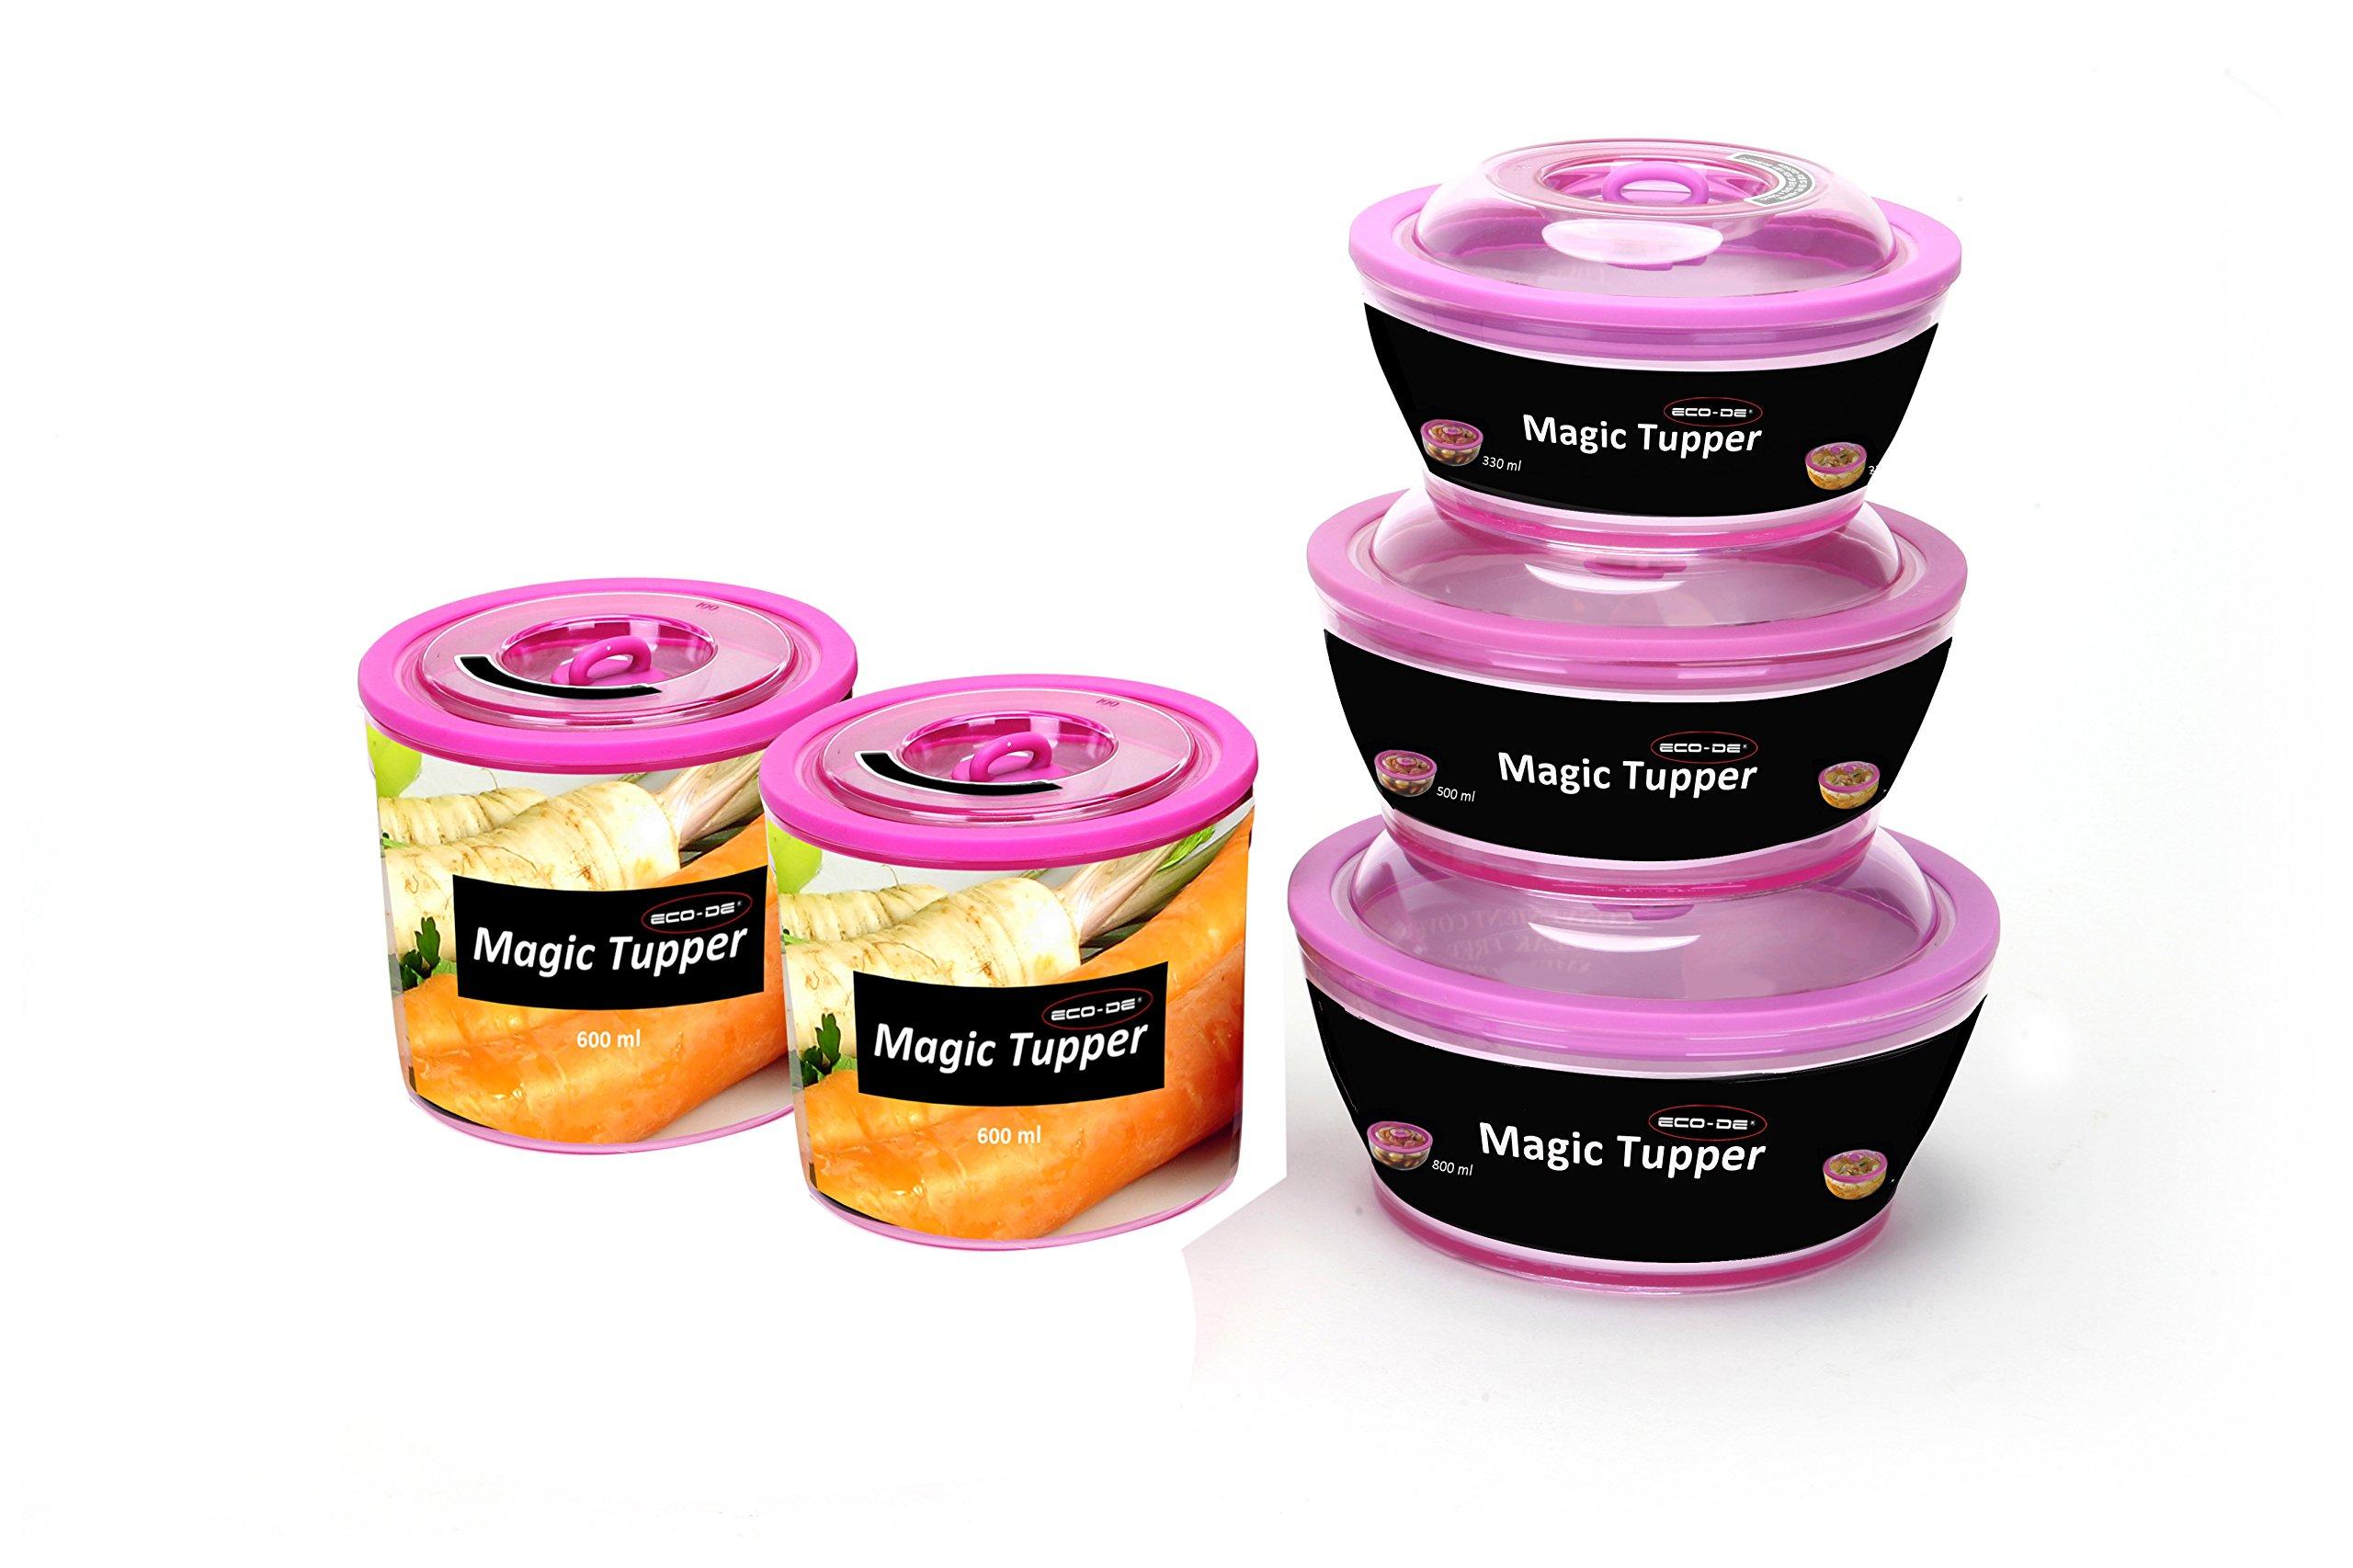 E-CODE Magic Tupper 10-Piece Storage Set